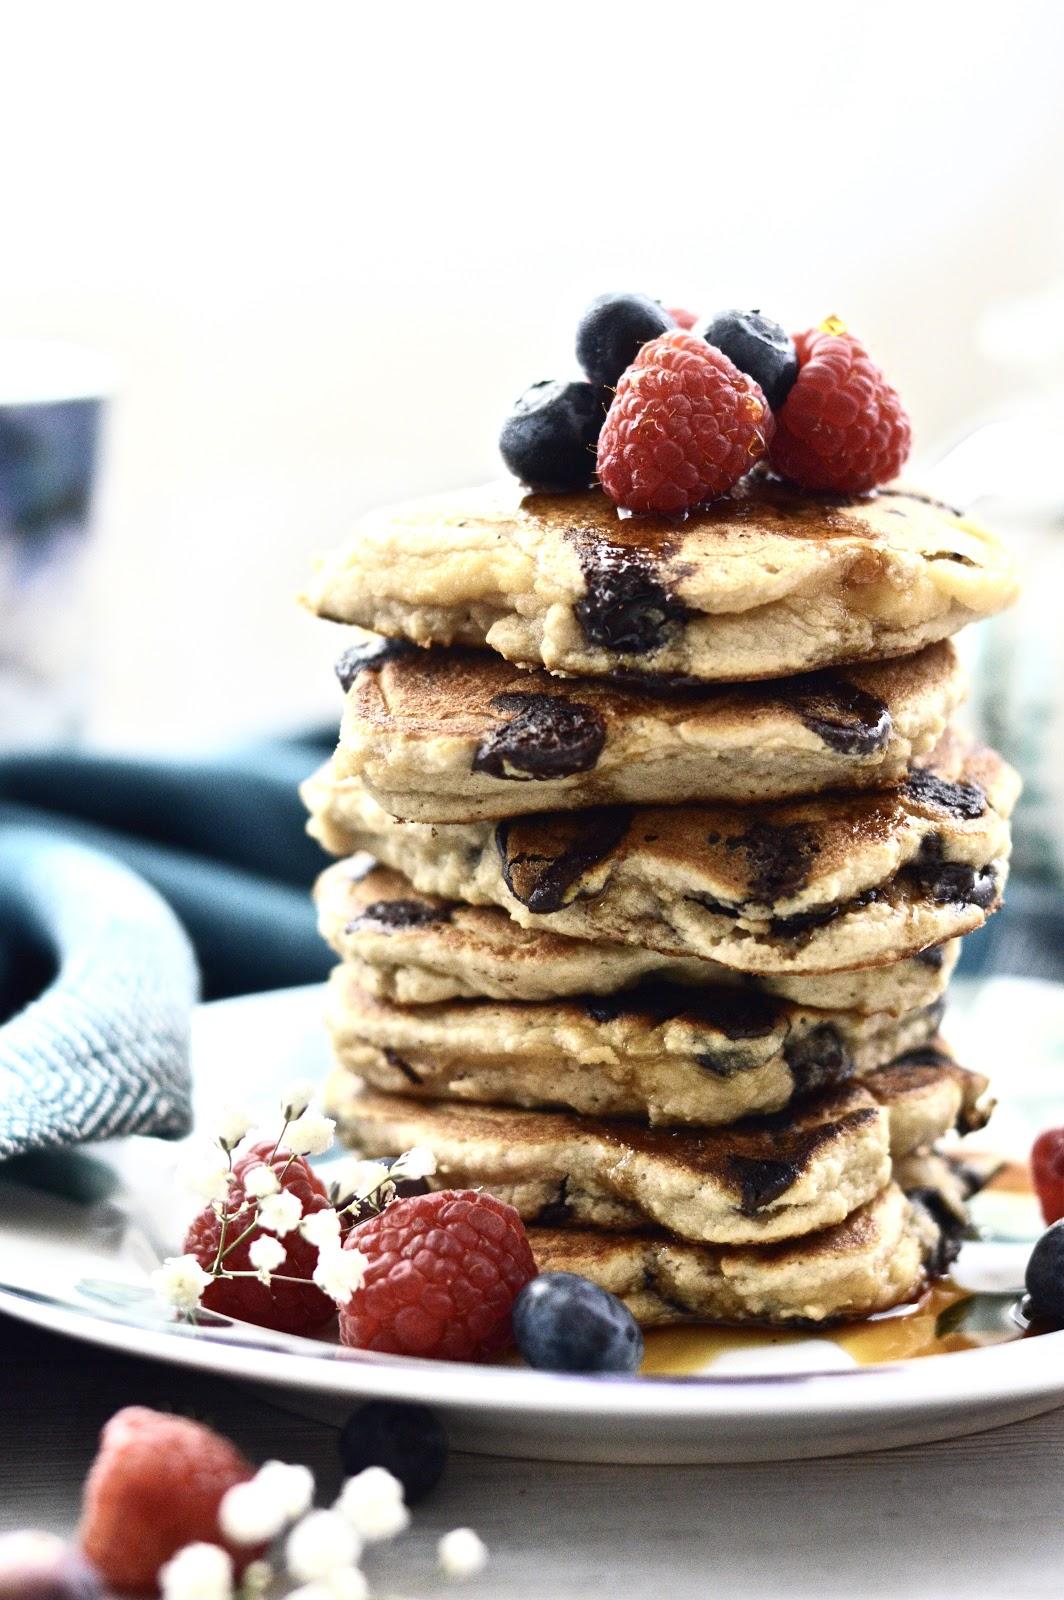 ... Silver Dollar Chocolate Chip Pancakes (Gluten Free, Grain Free, Dairy